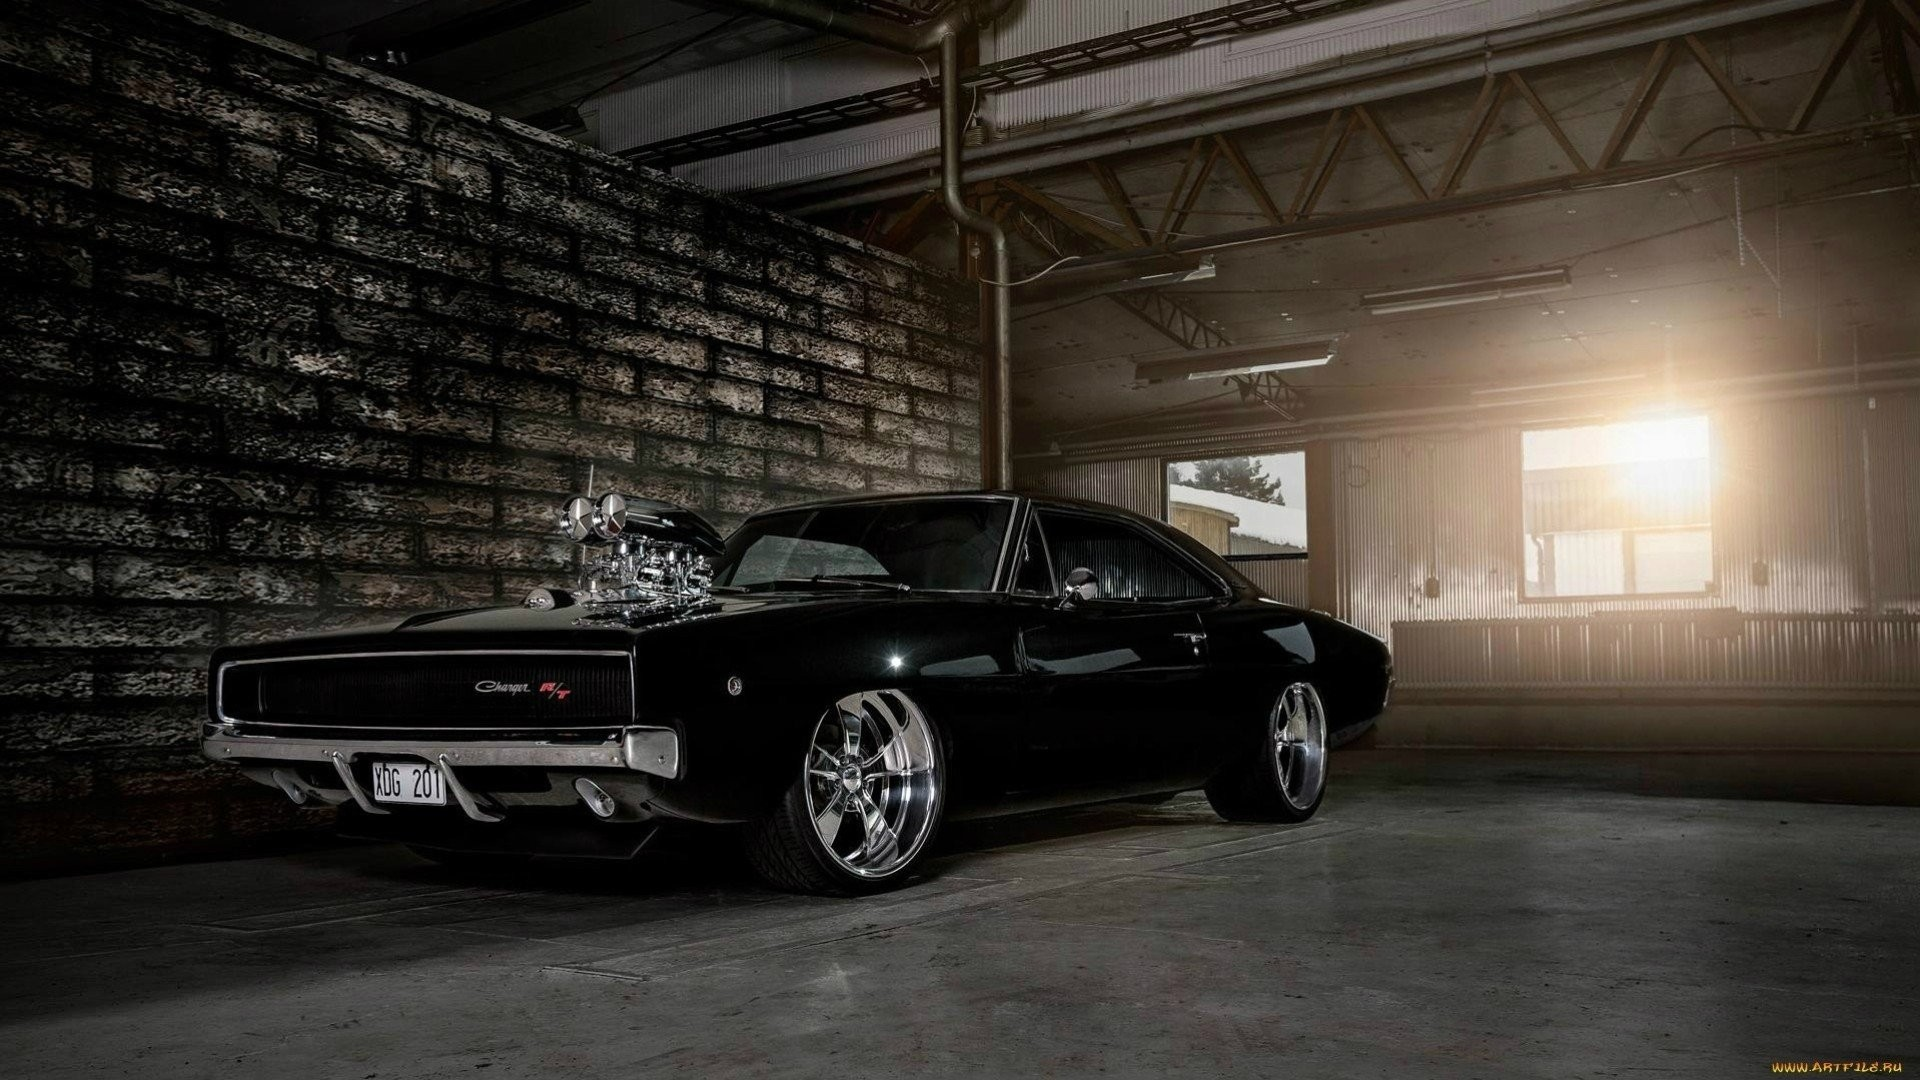 1920x1080 Mopar Black Classic